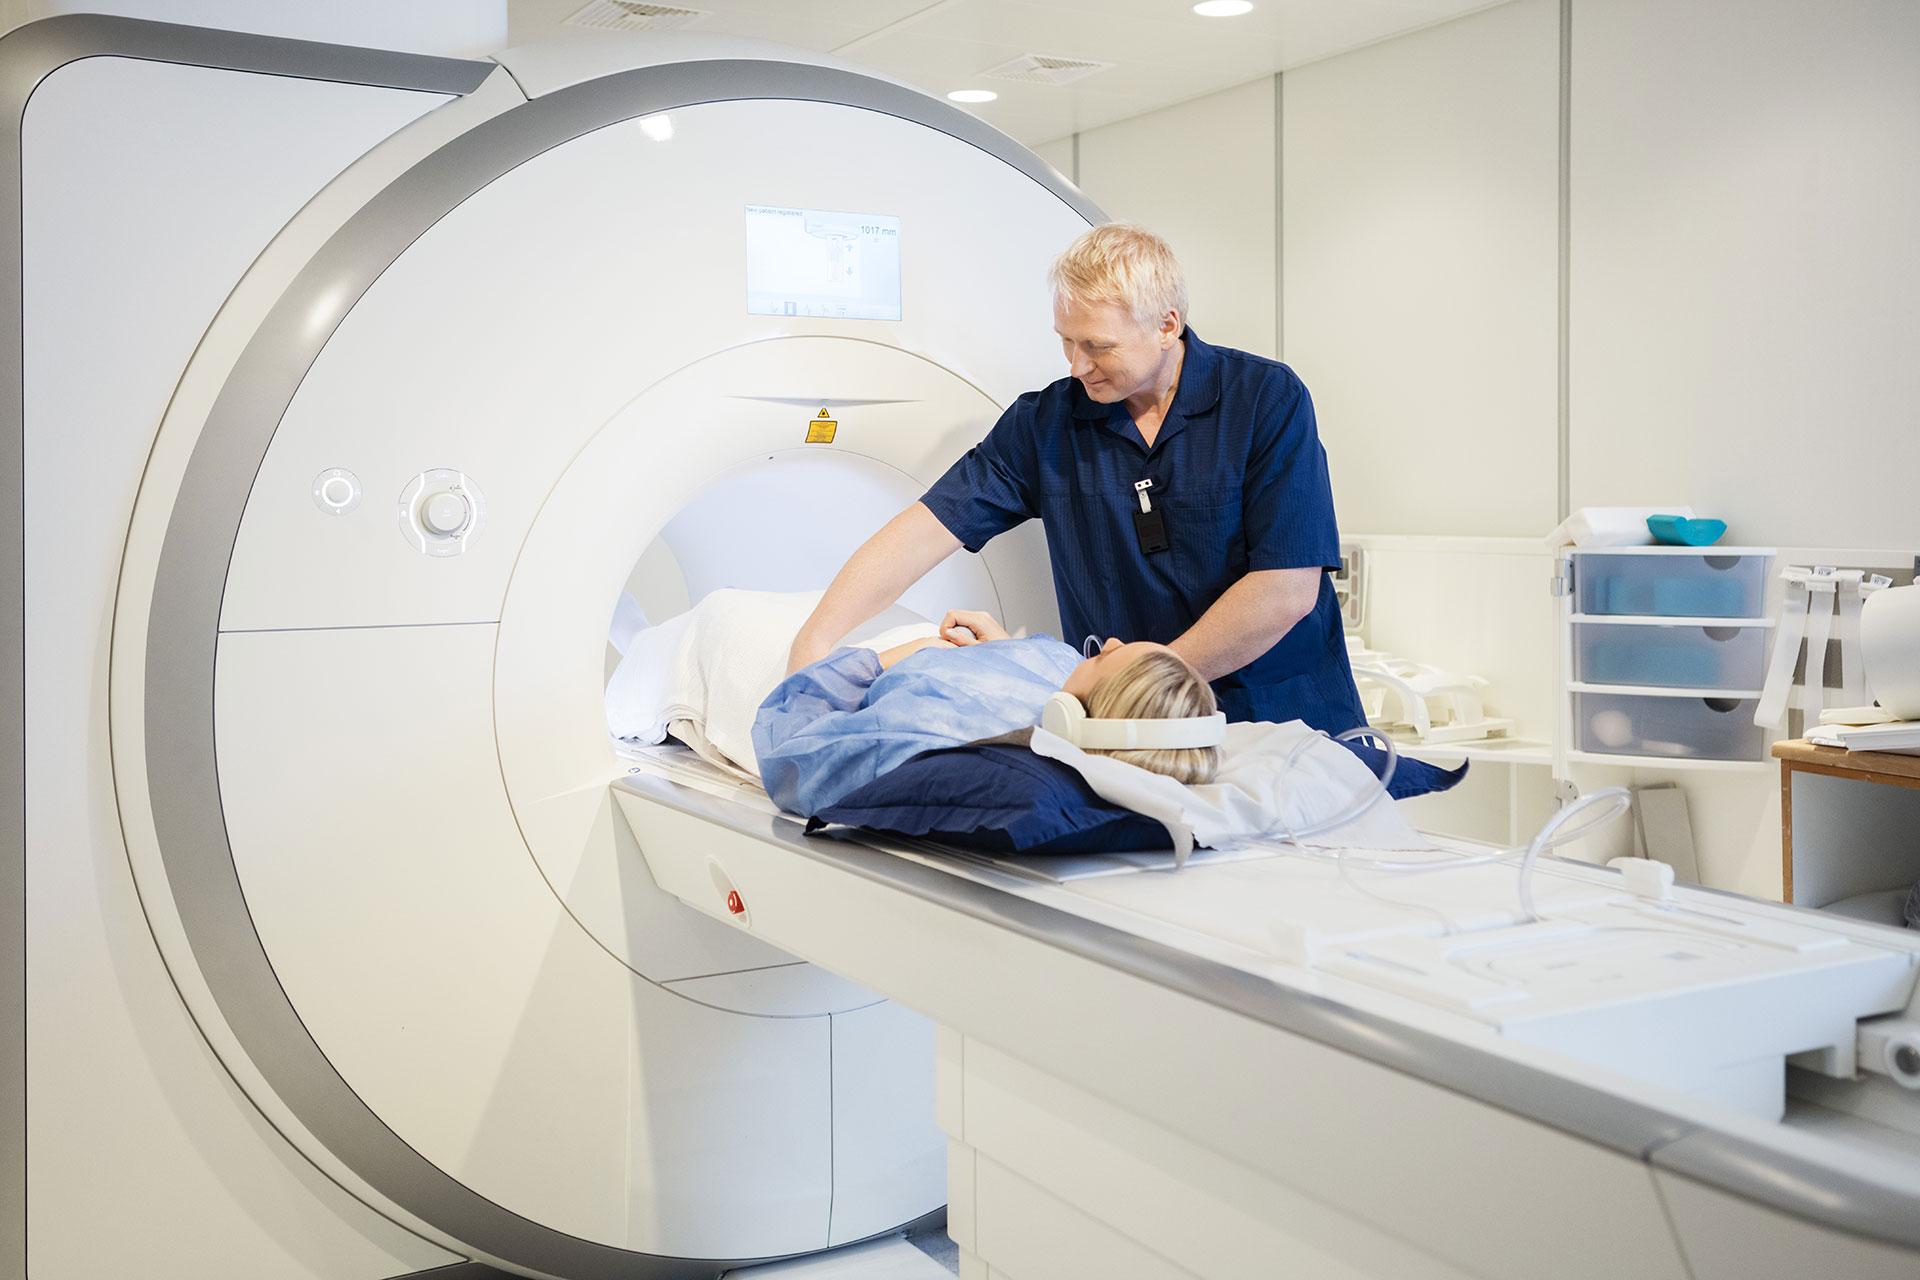 badanie rezonansem magnetycznym